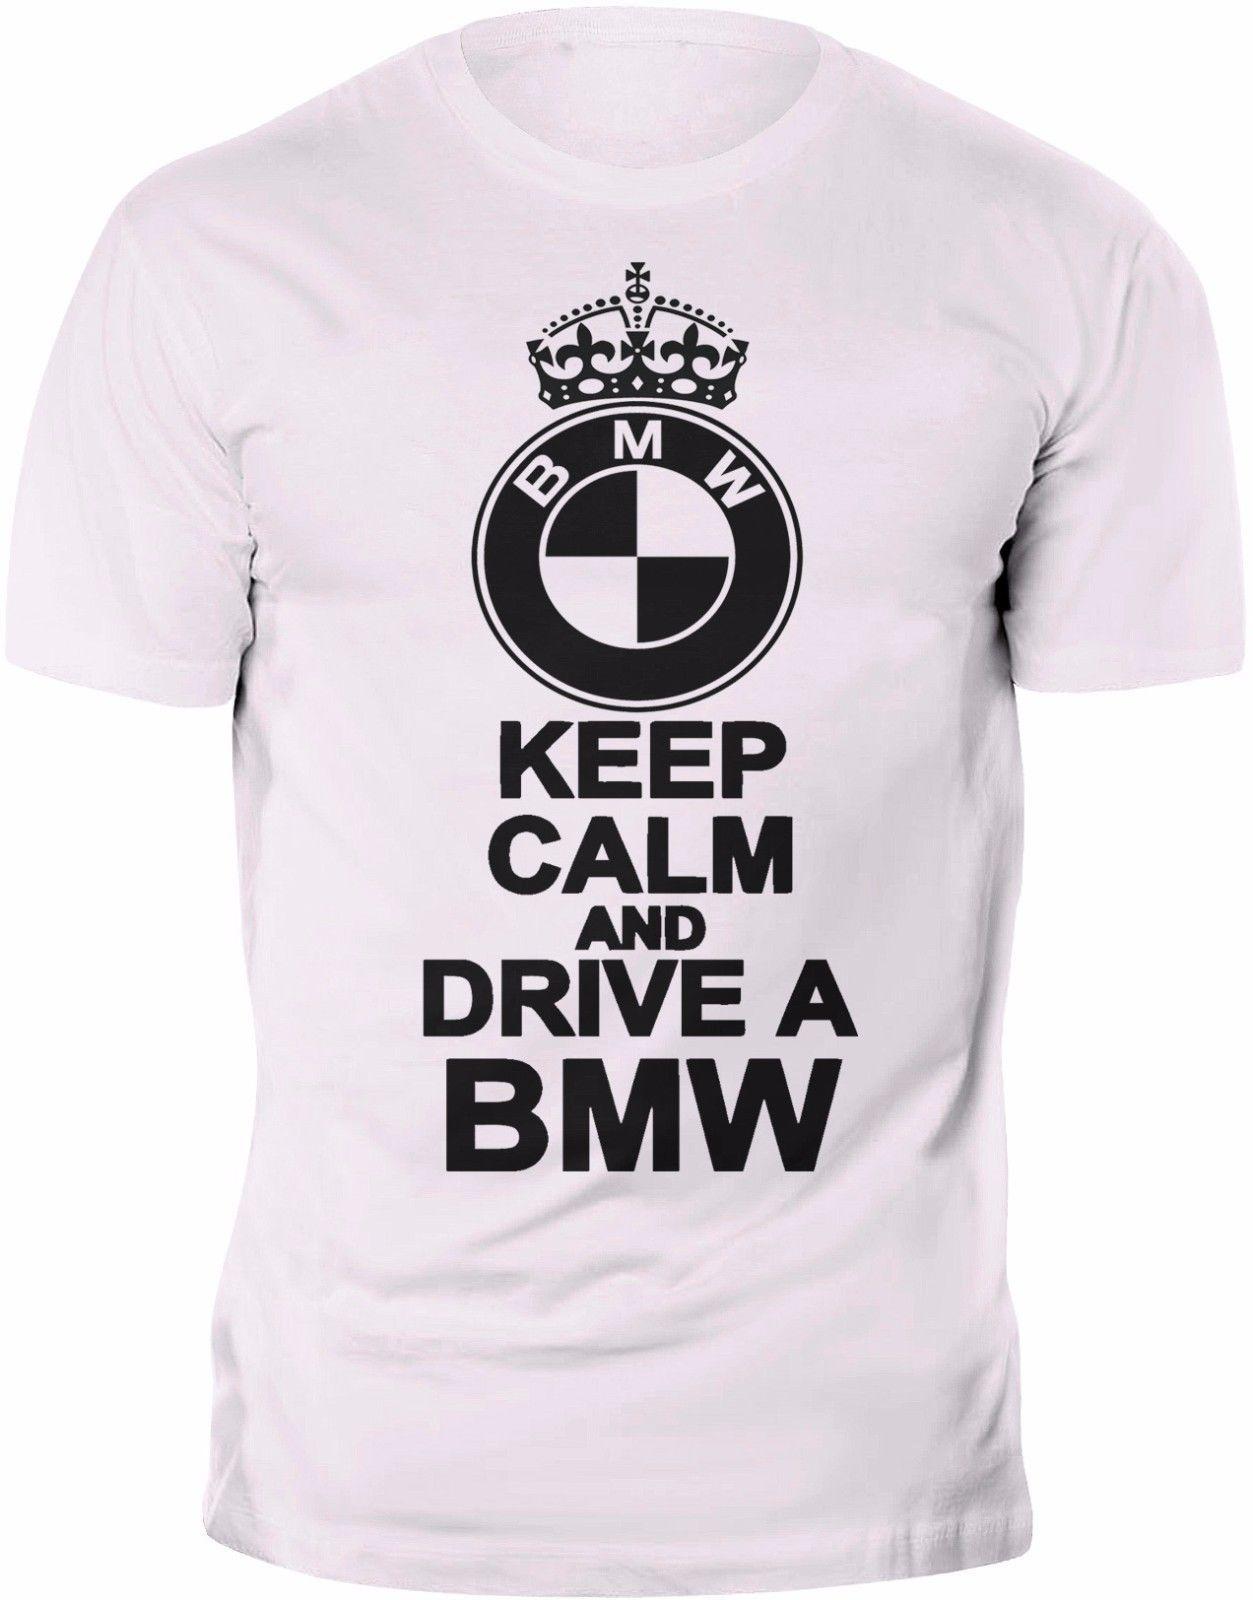 29d4eae2b New T-shirt O-Neck High Quality Hot Sell M Power M3 M4 M5 M6 M Power ...